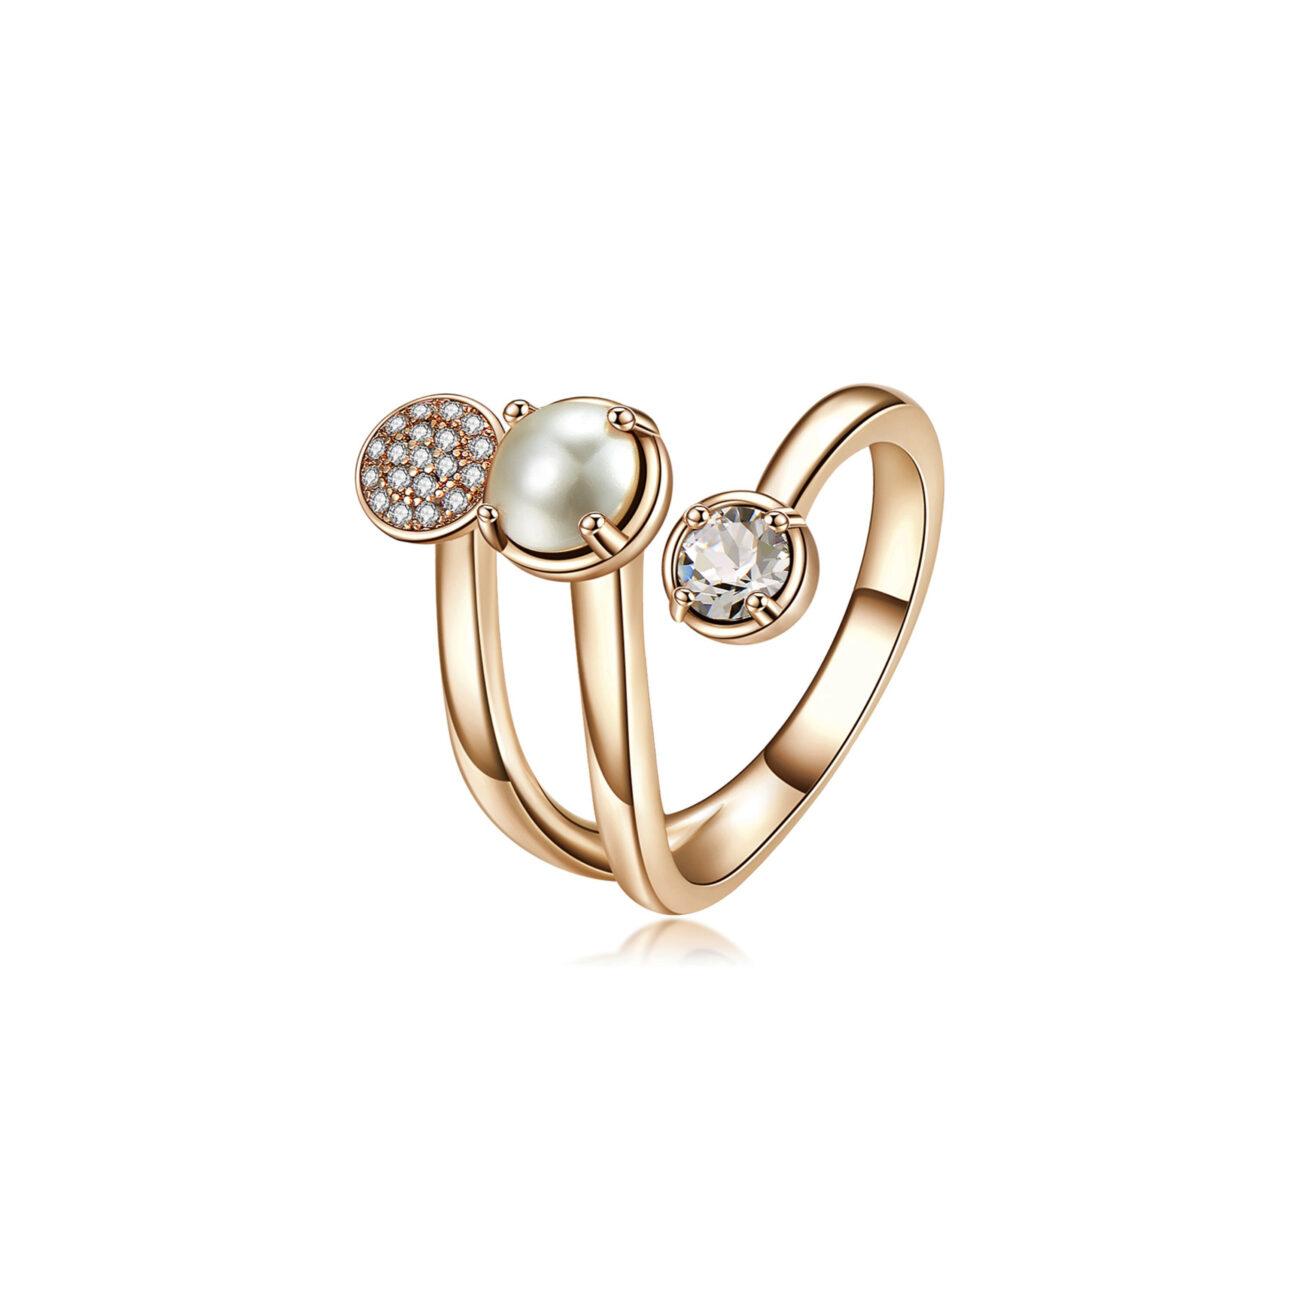 Brass ring, rose gold galvanic, golden Swarovski©crystals, pearl and white zircons